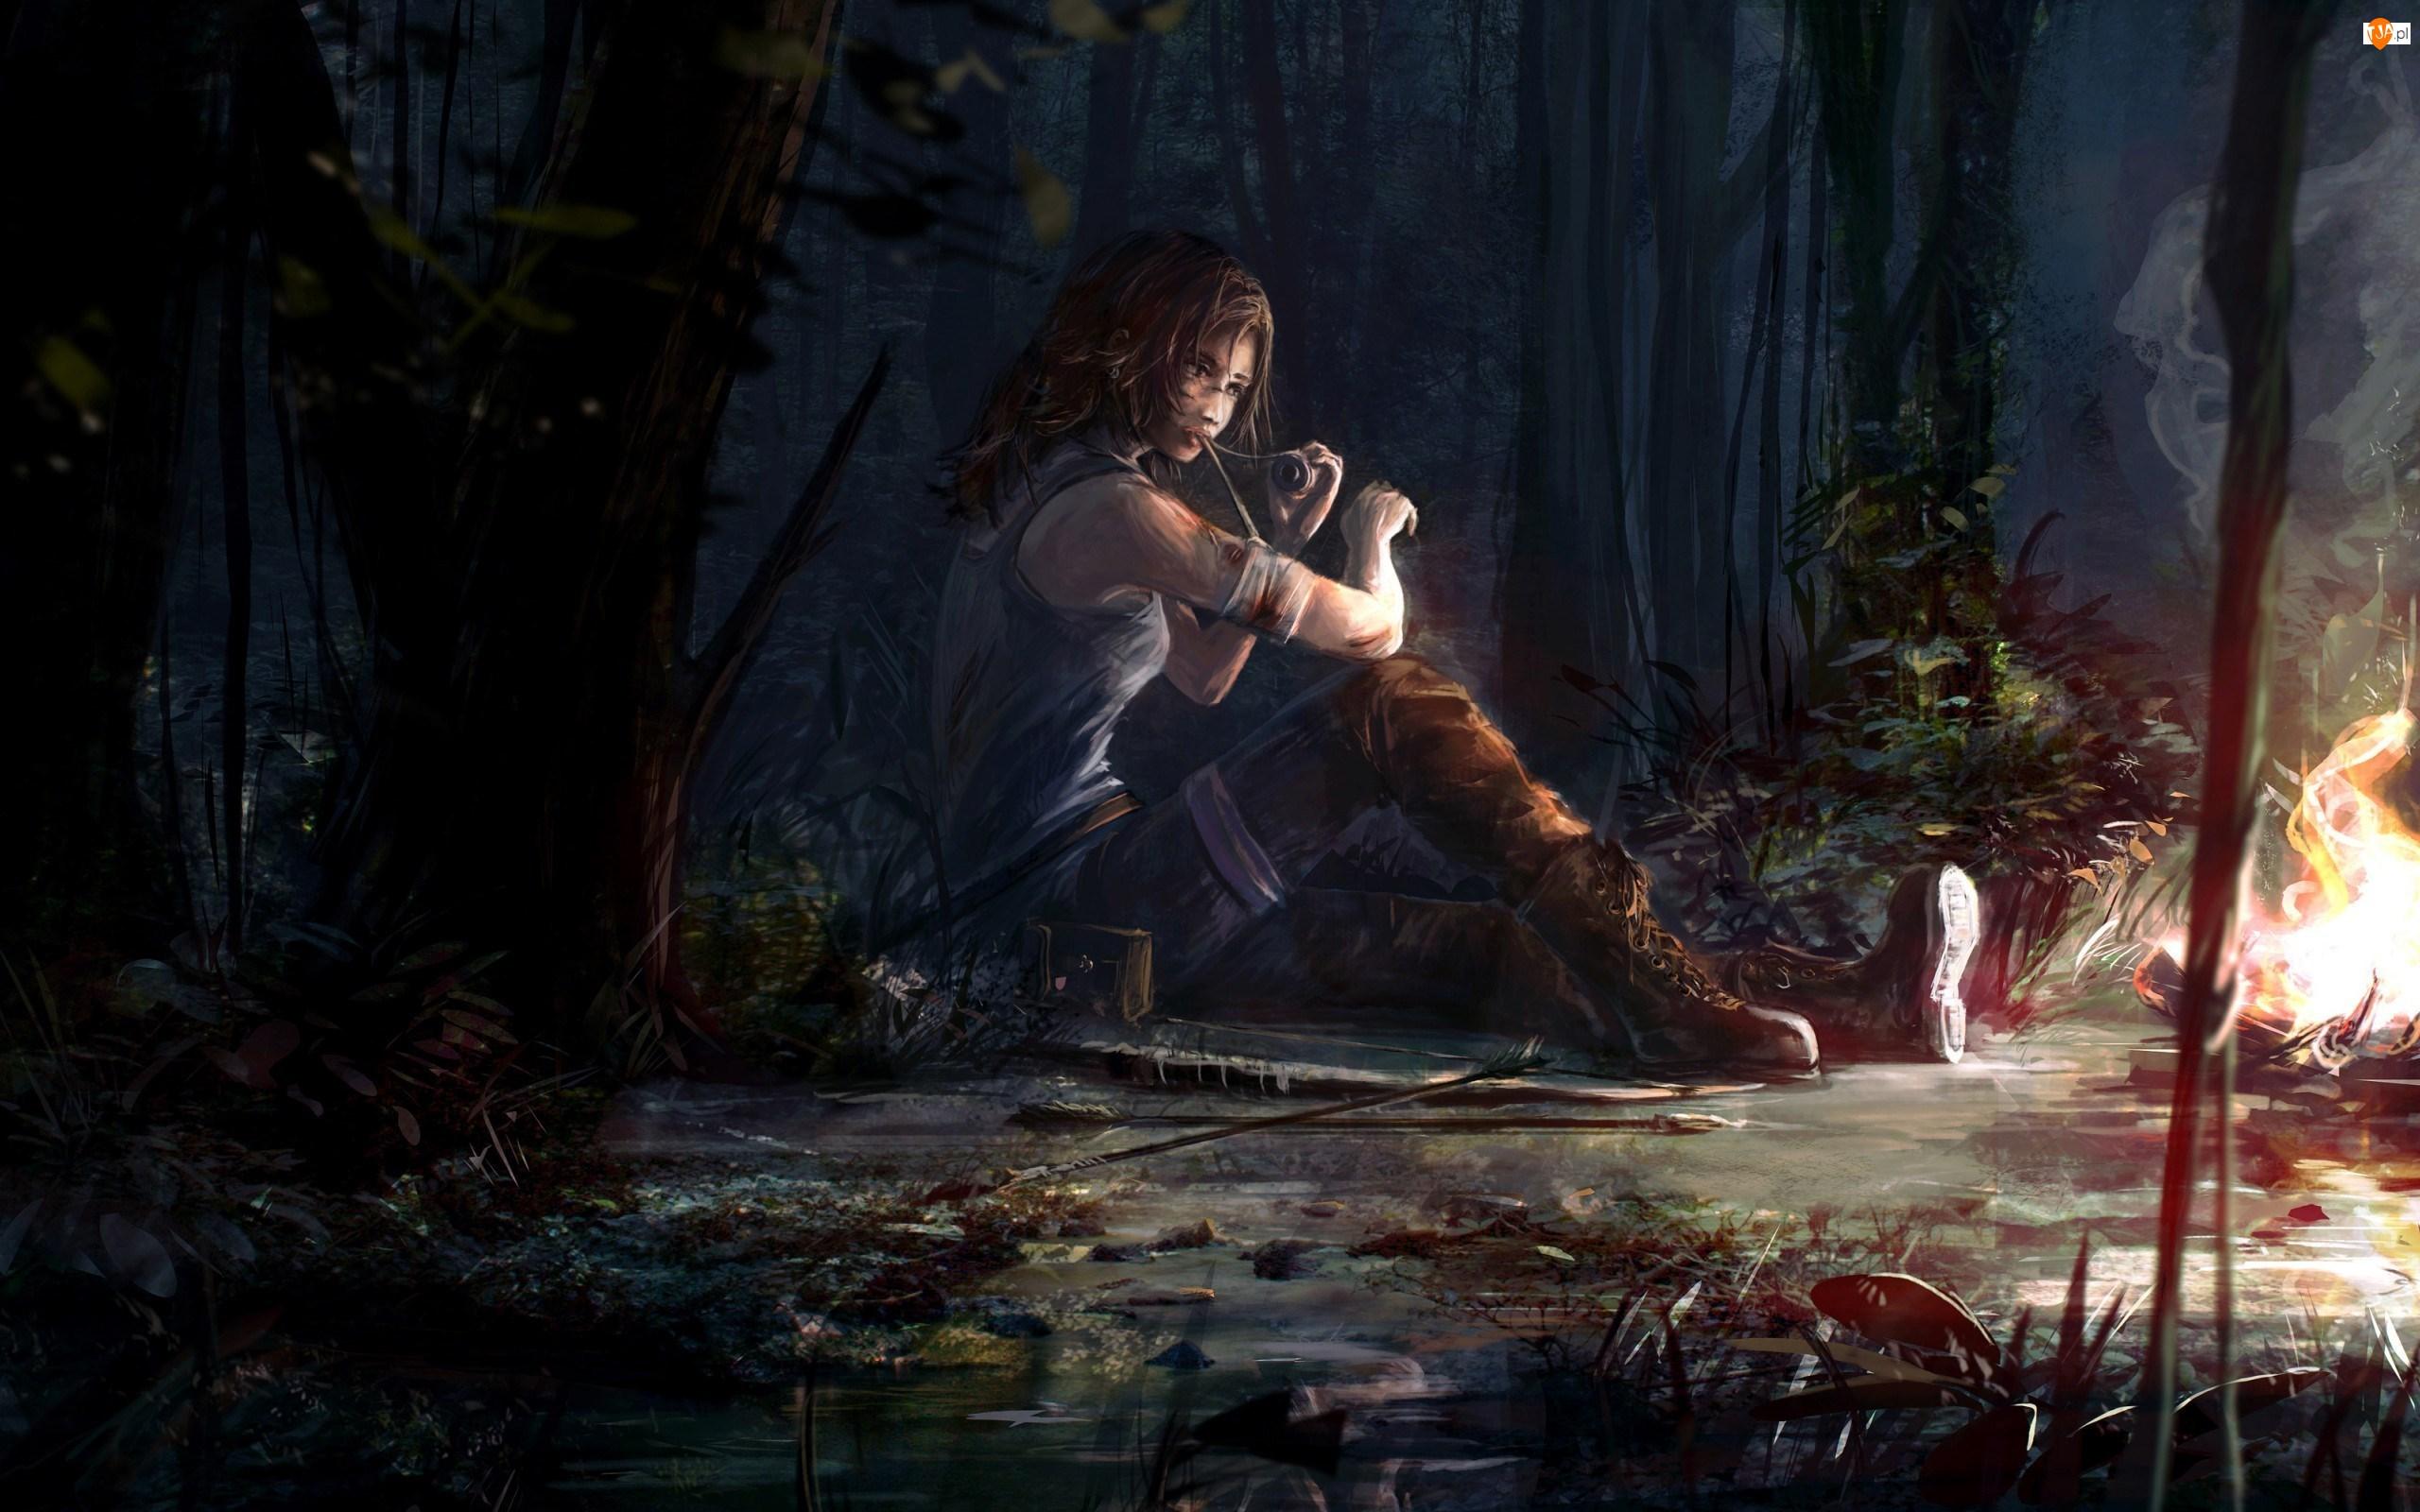 Tomb Raider, Lara Croft, Las, Ranna, Ognisko